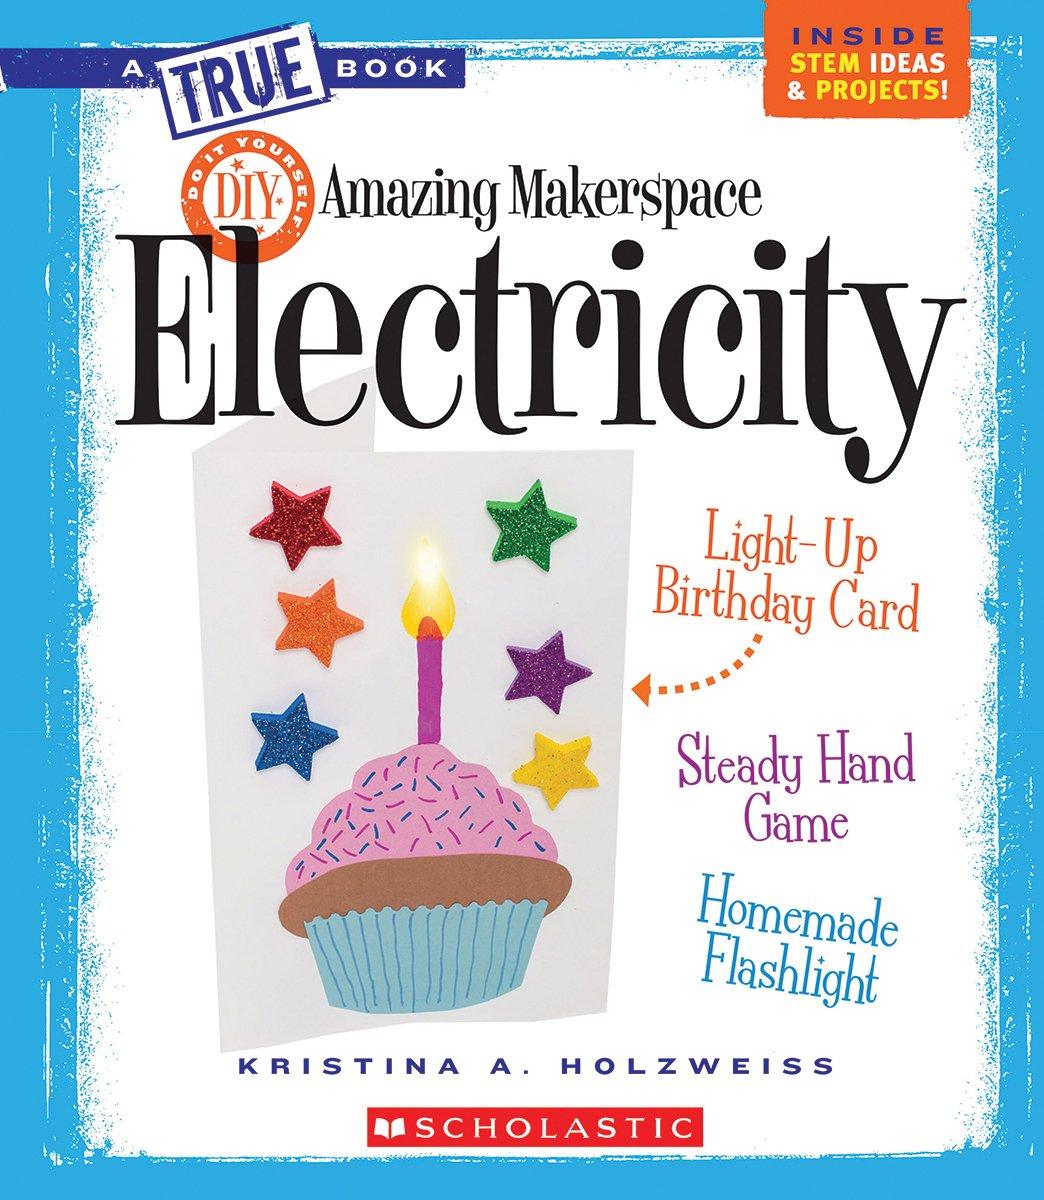 Amazing Makerspace DIY Electricity (True Books) (True Books: Amazing Makerspace DIY)